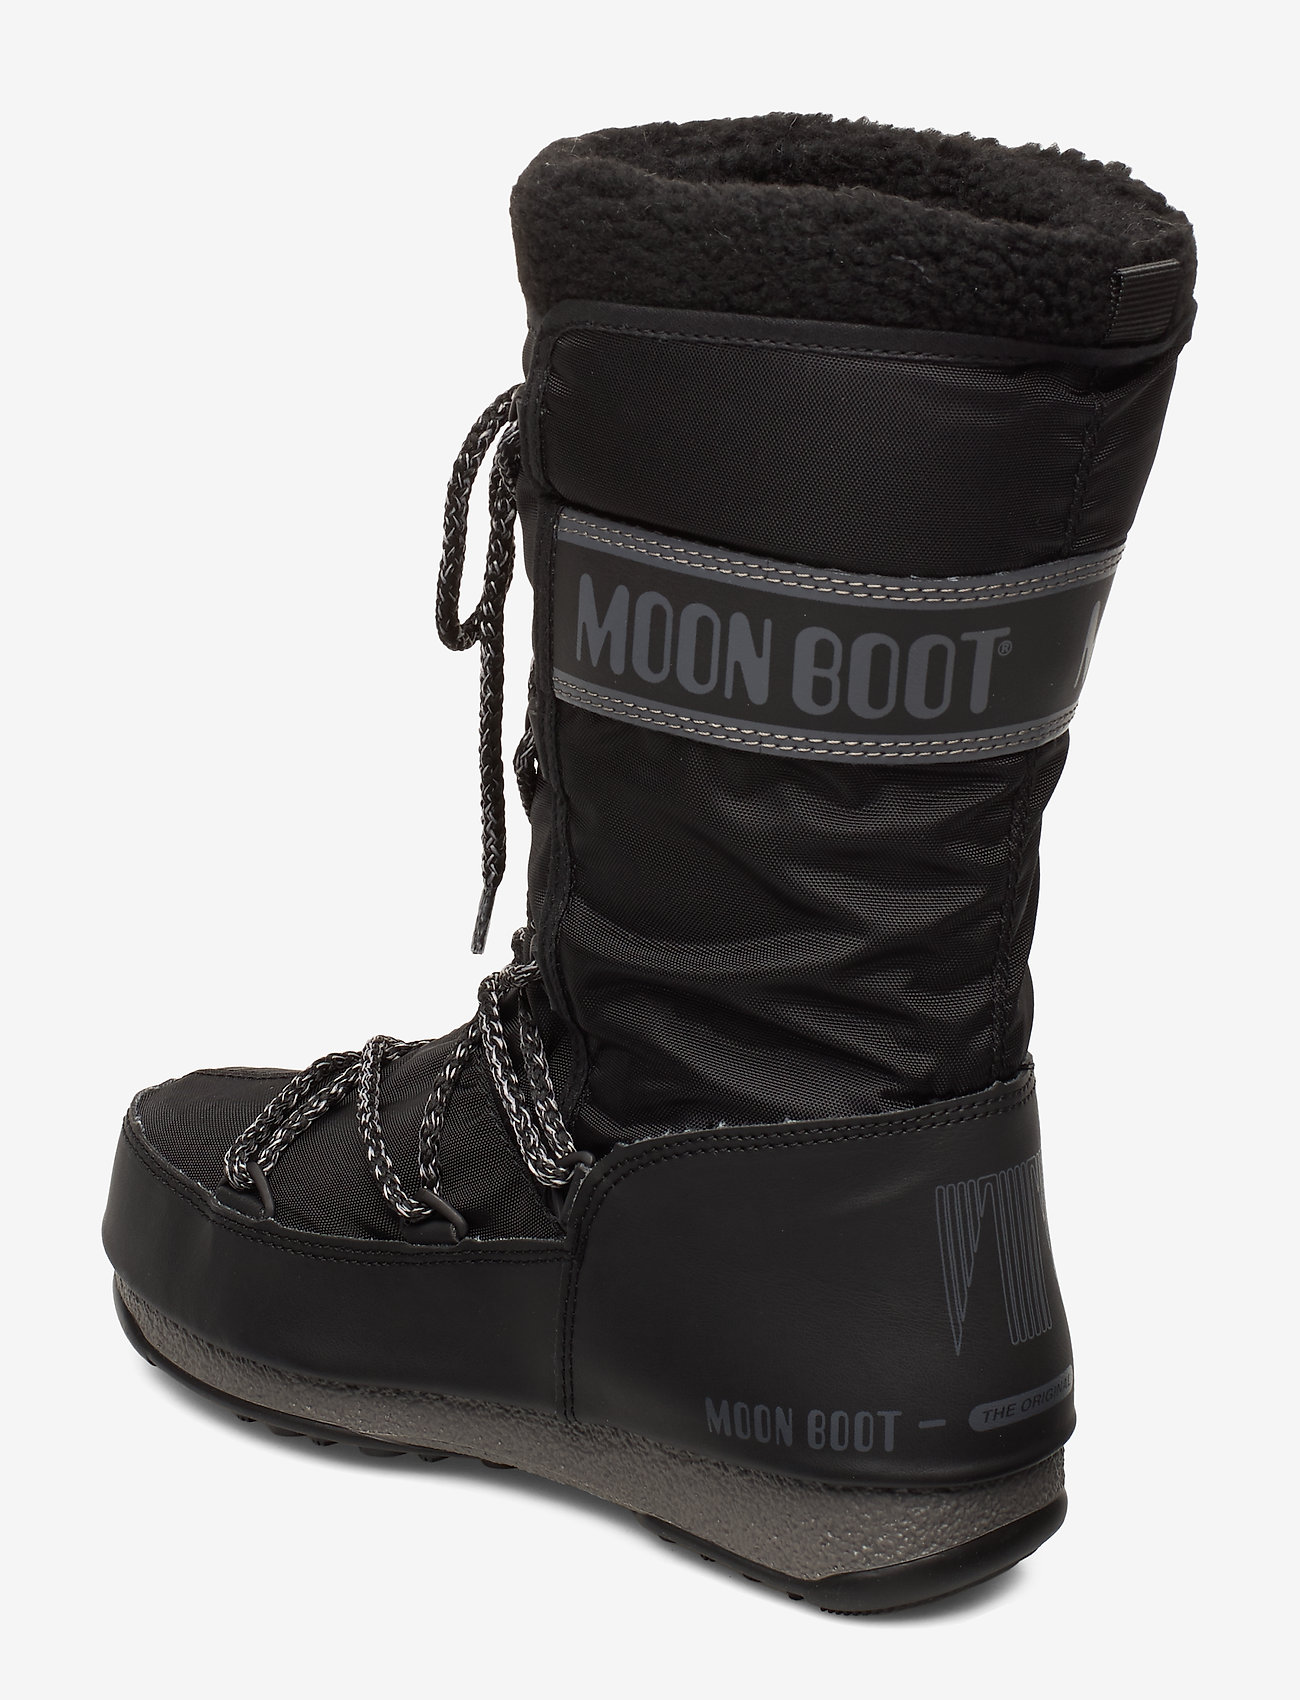 Mb Monaco Wool Wp (Black) - Moon Boot